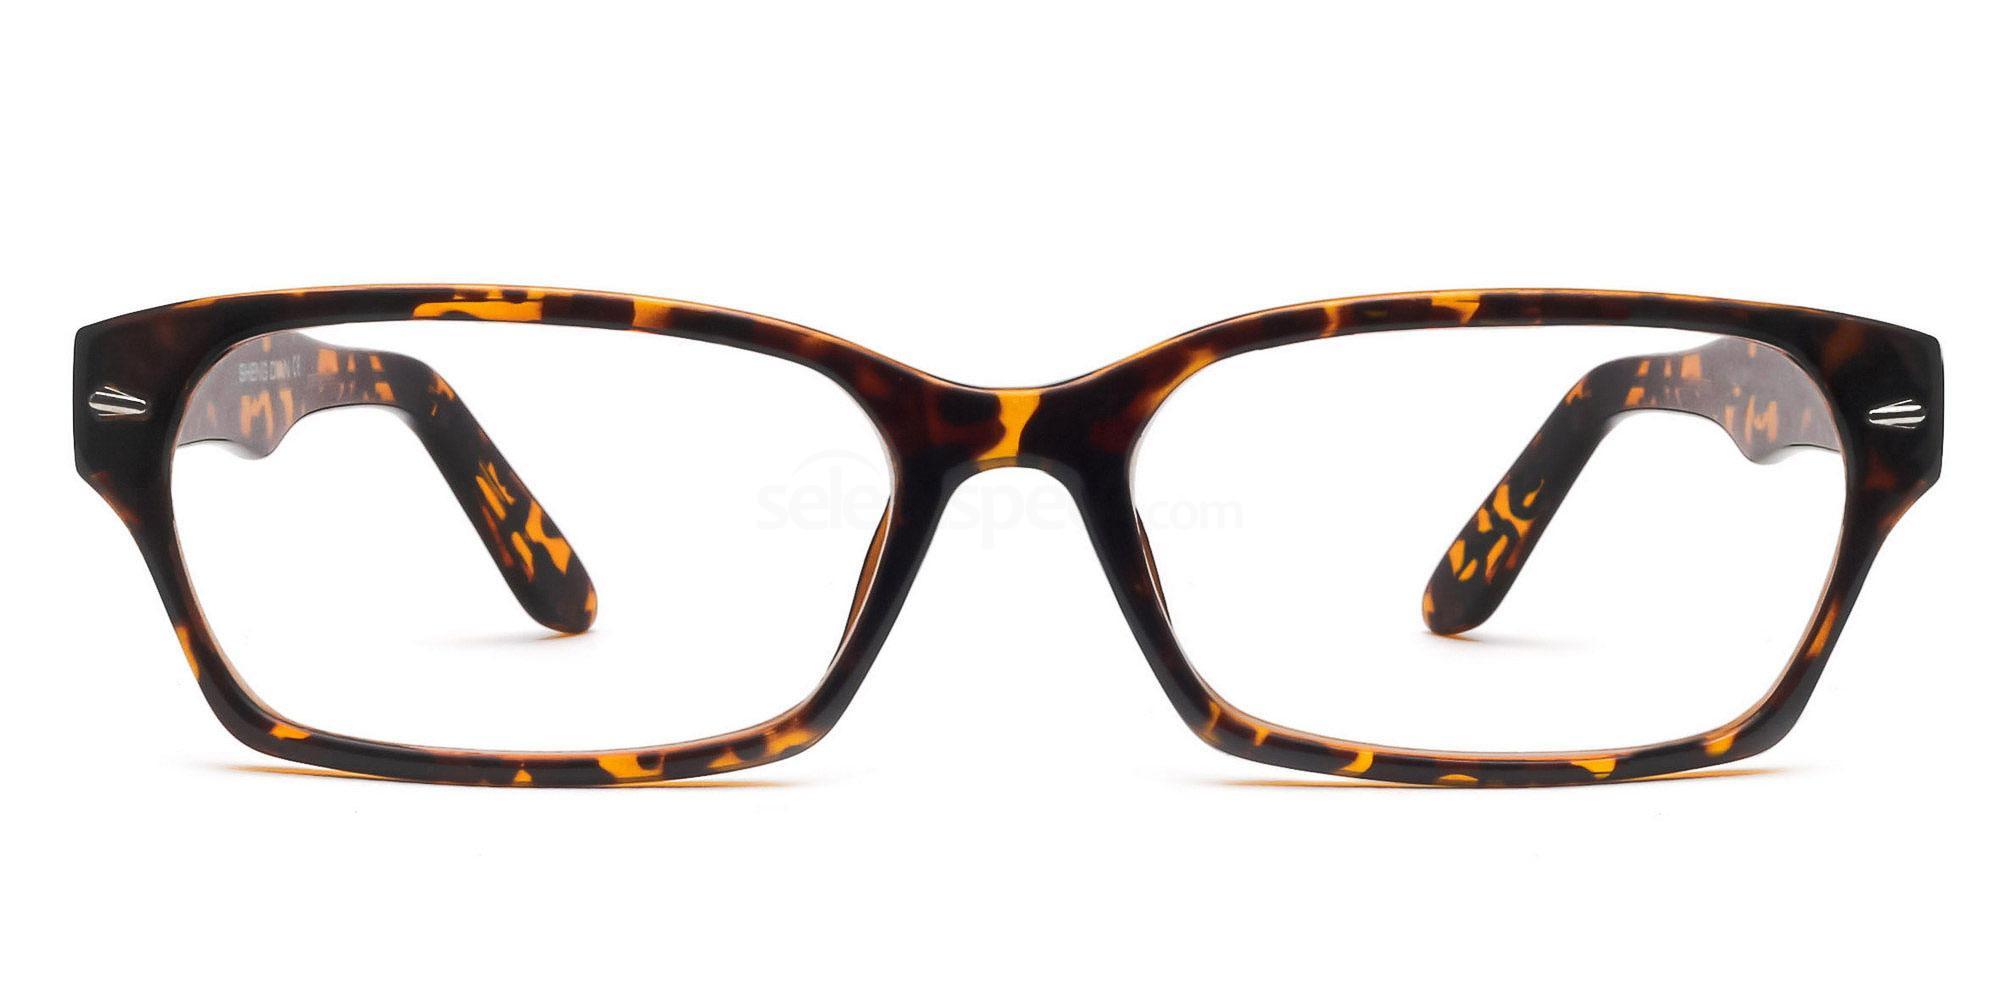 Demi P2267 - Demi Glasses, Savannah